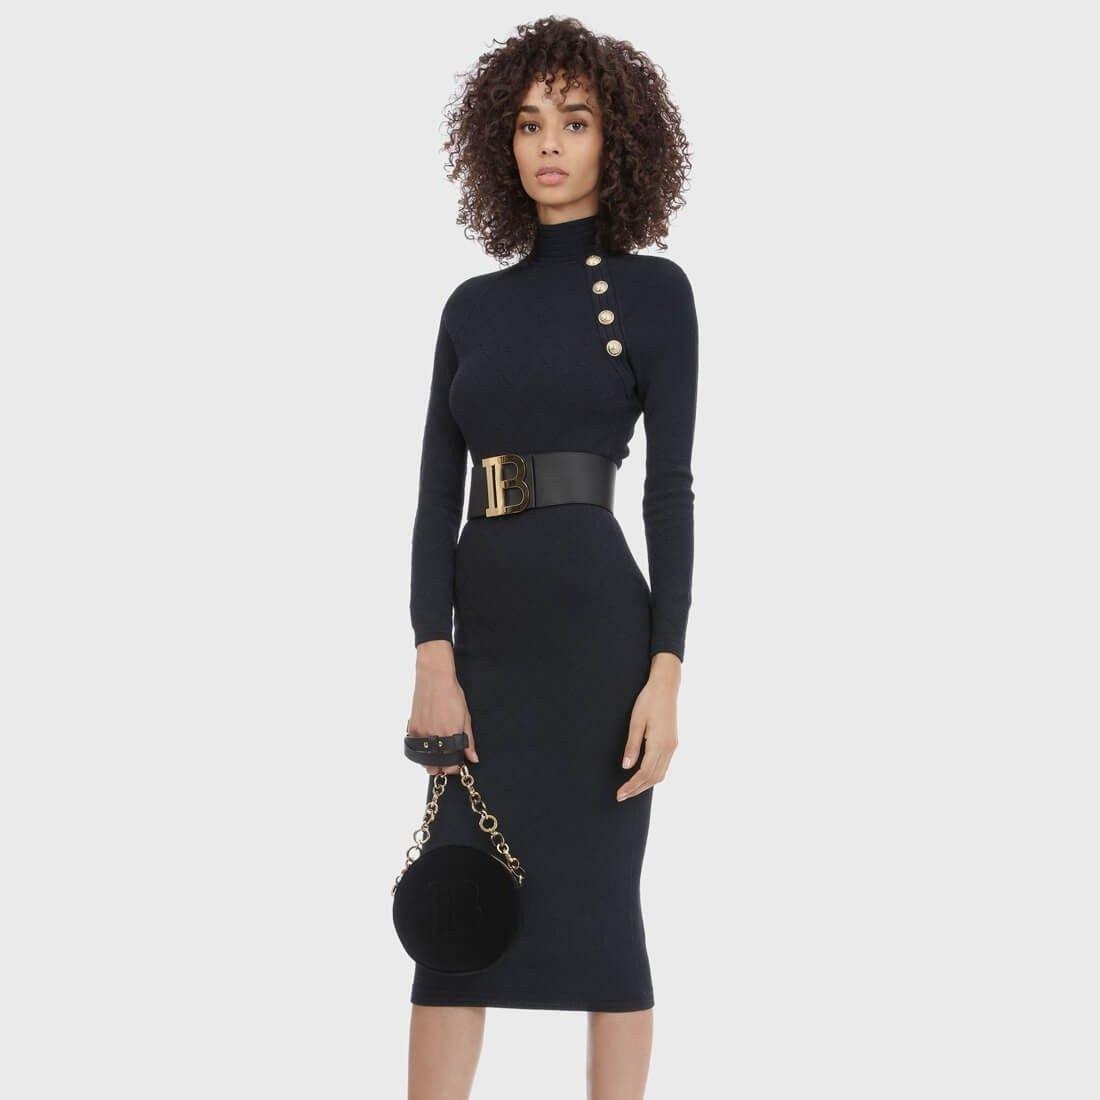 Объект желания: платье-футляр